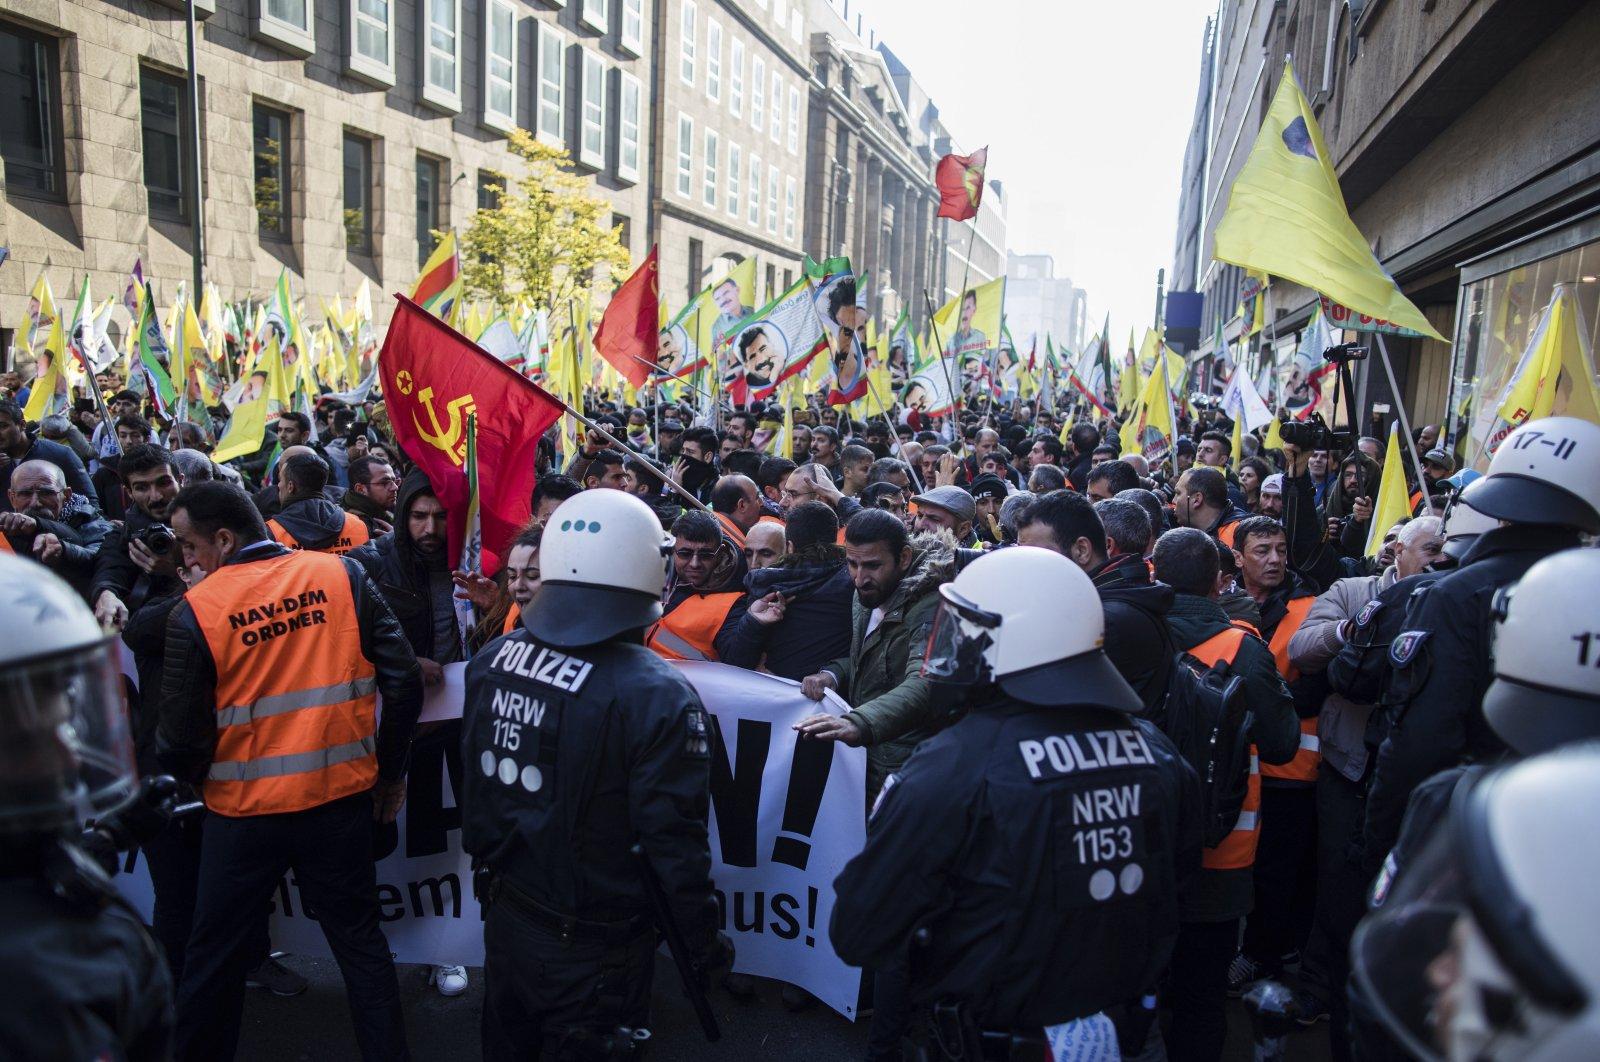 PKK supporters hold a demonstration in Germany's Düsseldorf, Nov. 4, 2017. (AP Photo)